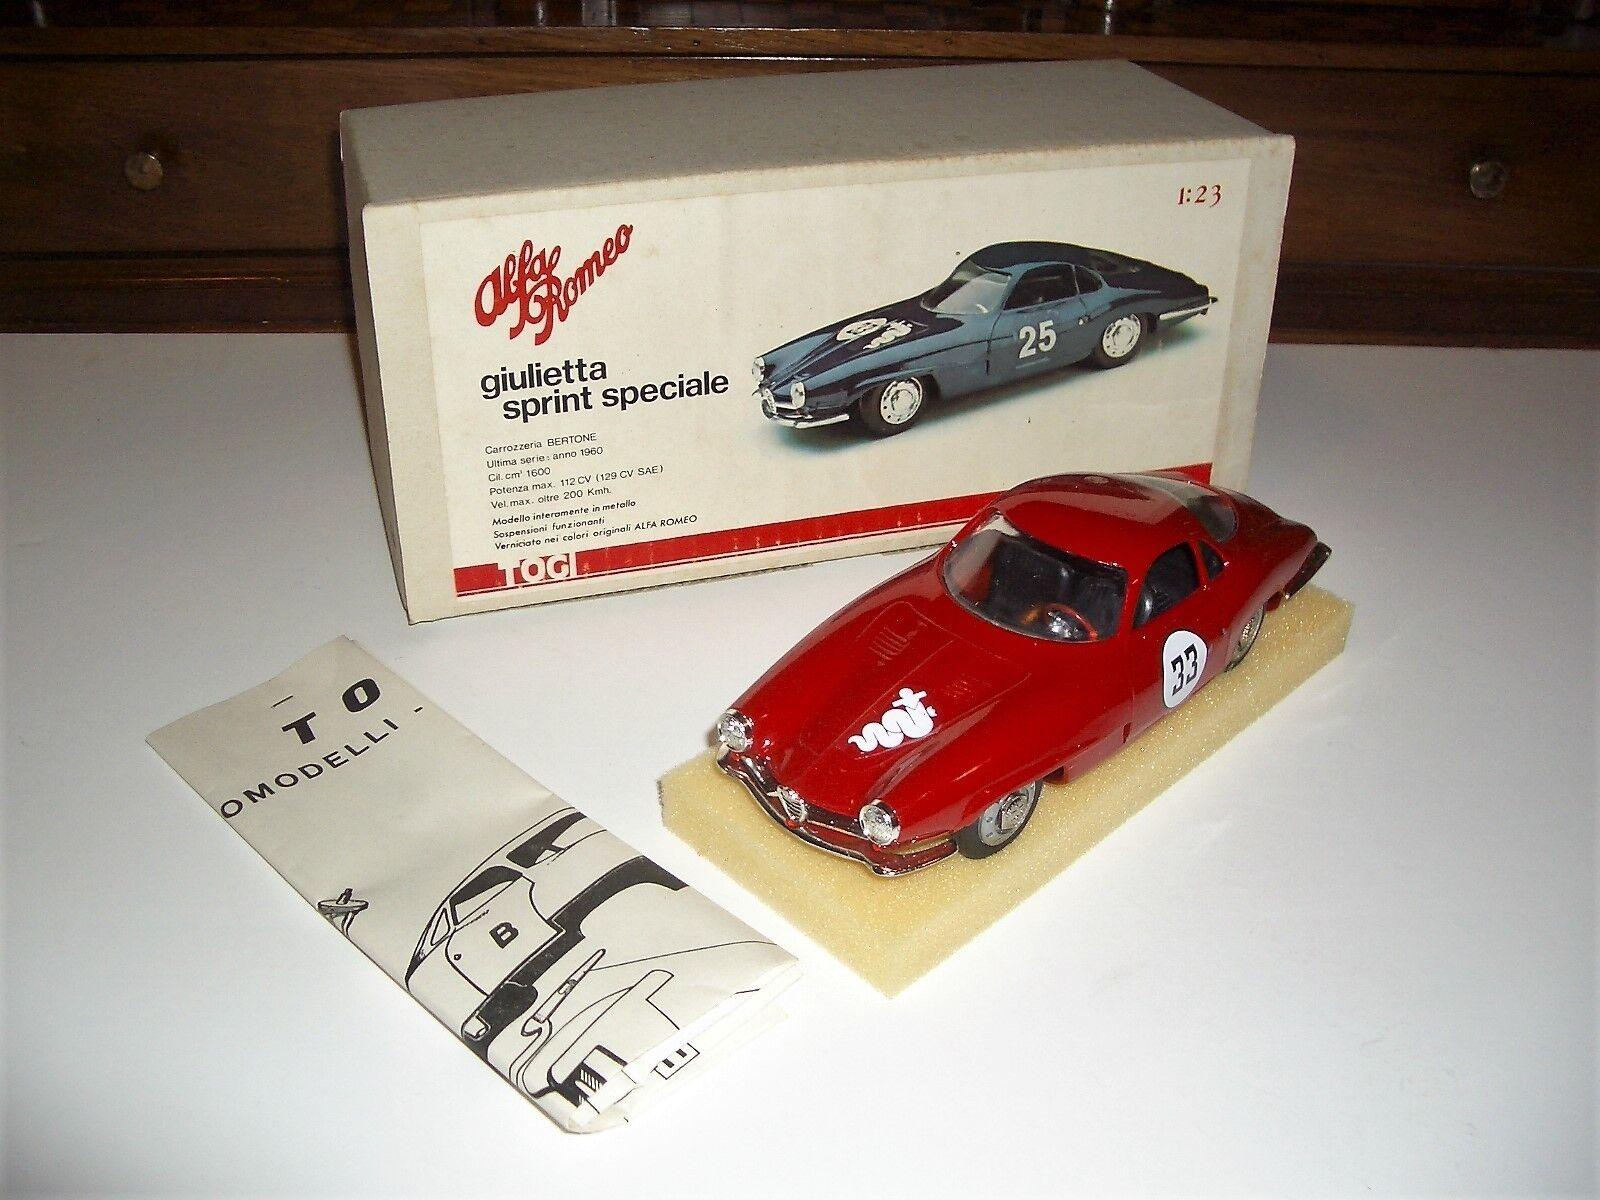 1 23 TOGI Alfa Romeo Giulietta SS Sprint Speciale 1960  33 rouge MIB Very Rare